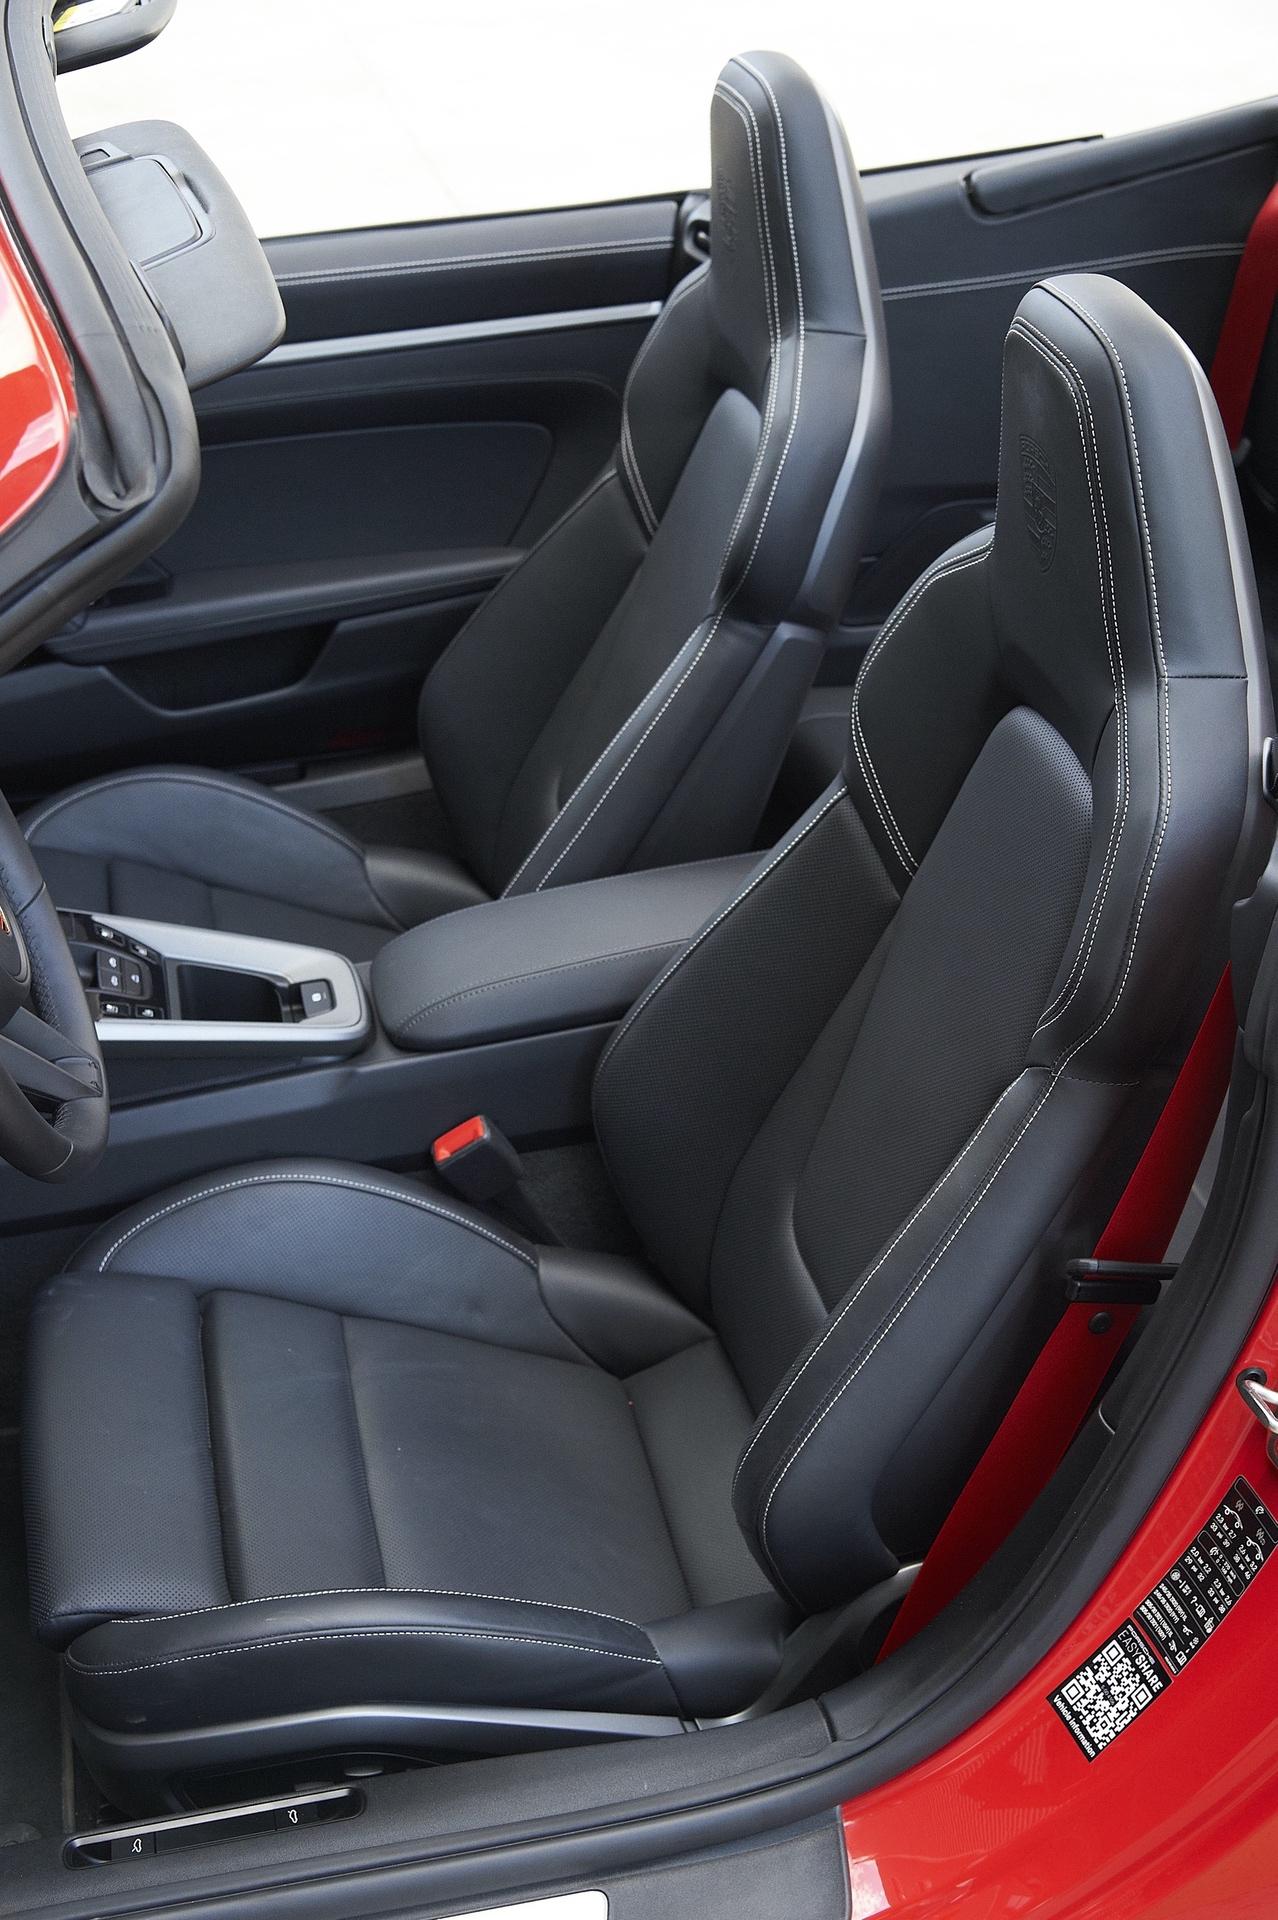 Test_Drive_Porsche_911_Athens_0163